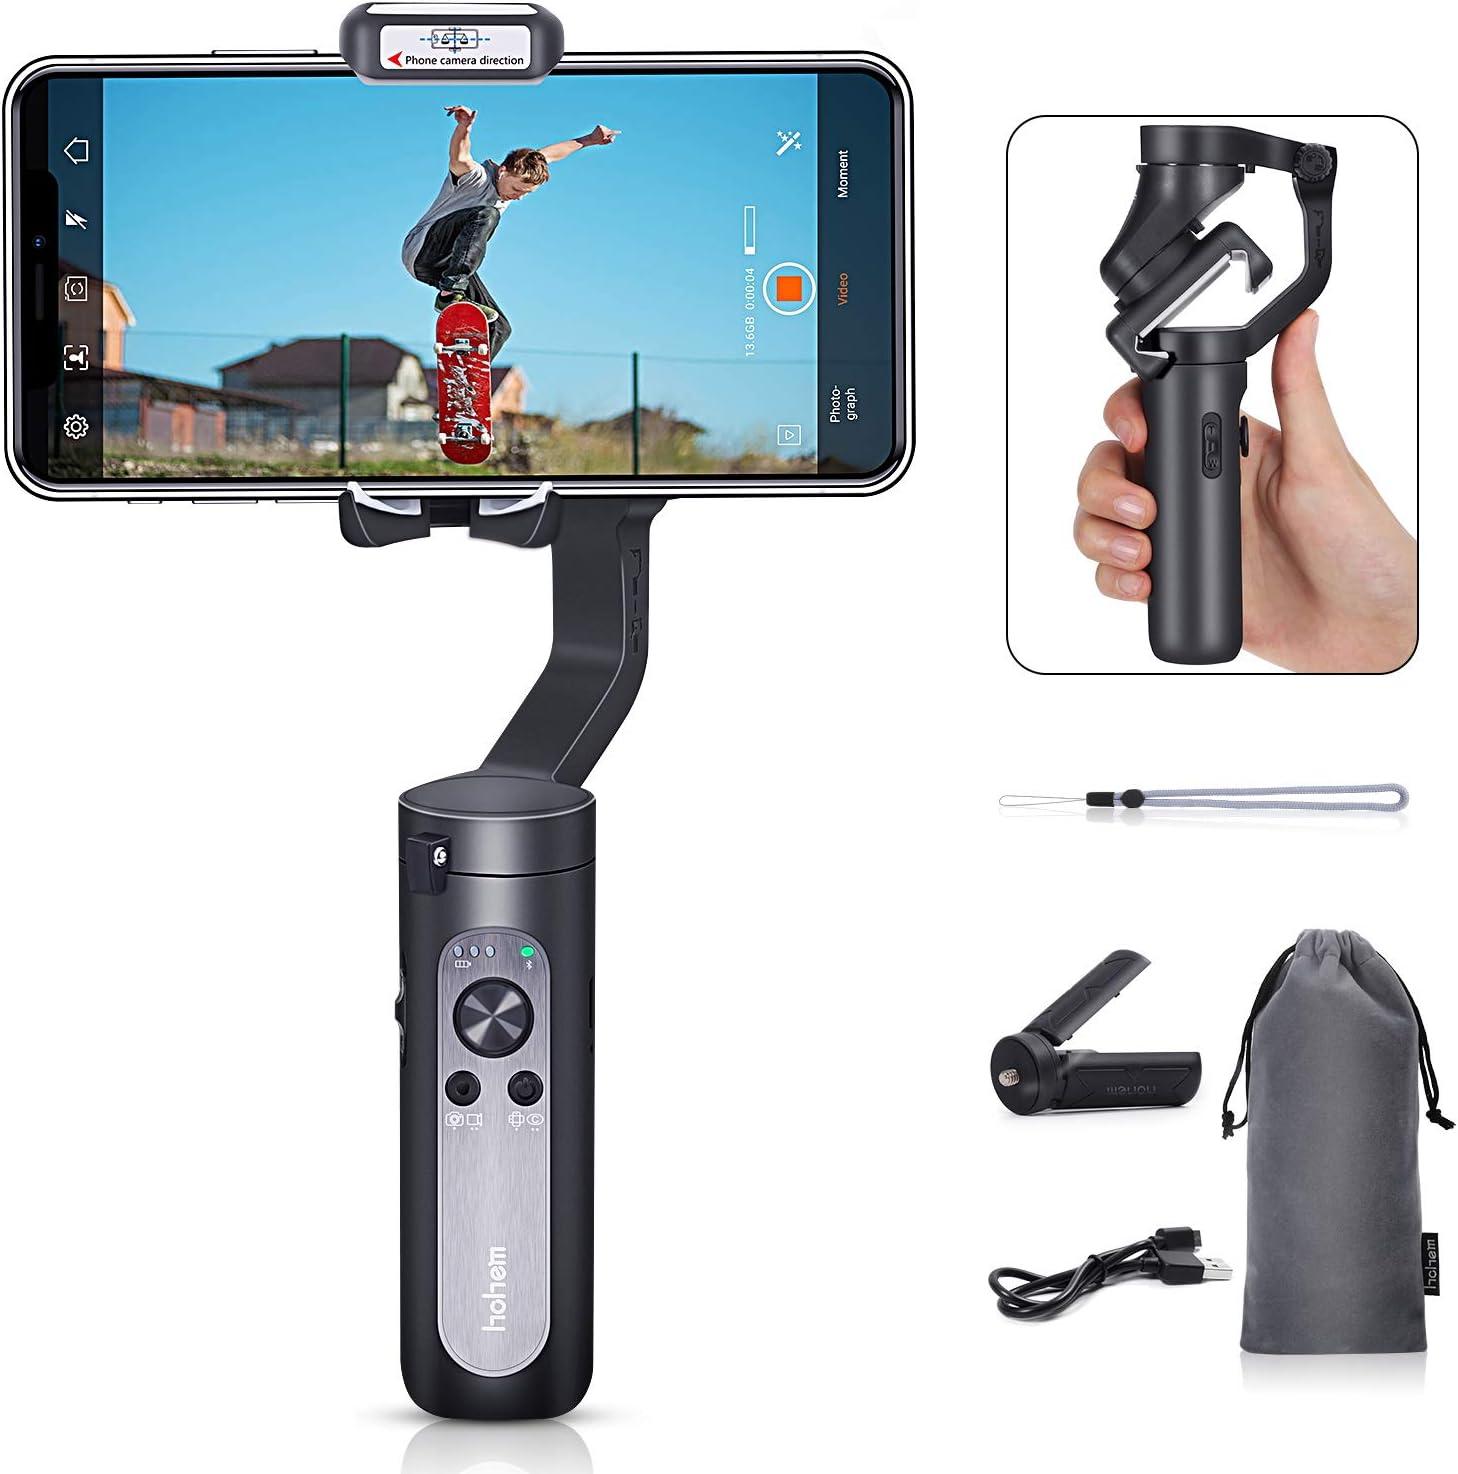 Hohem 2019 Smartphone Gimbal Stabilizer Gimble de Mano de 3 Ejes ...